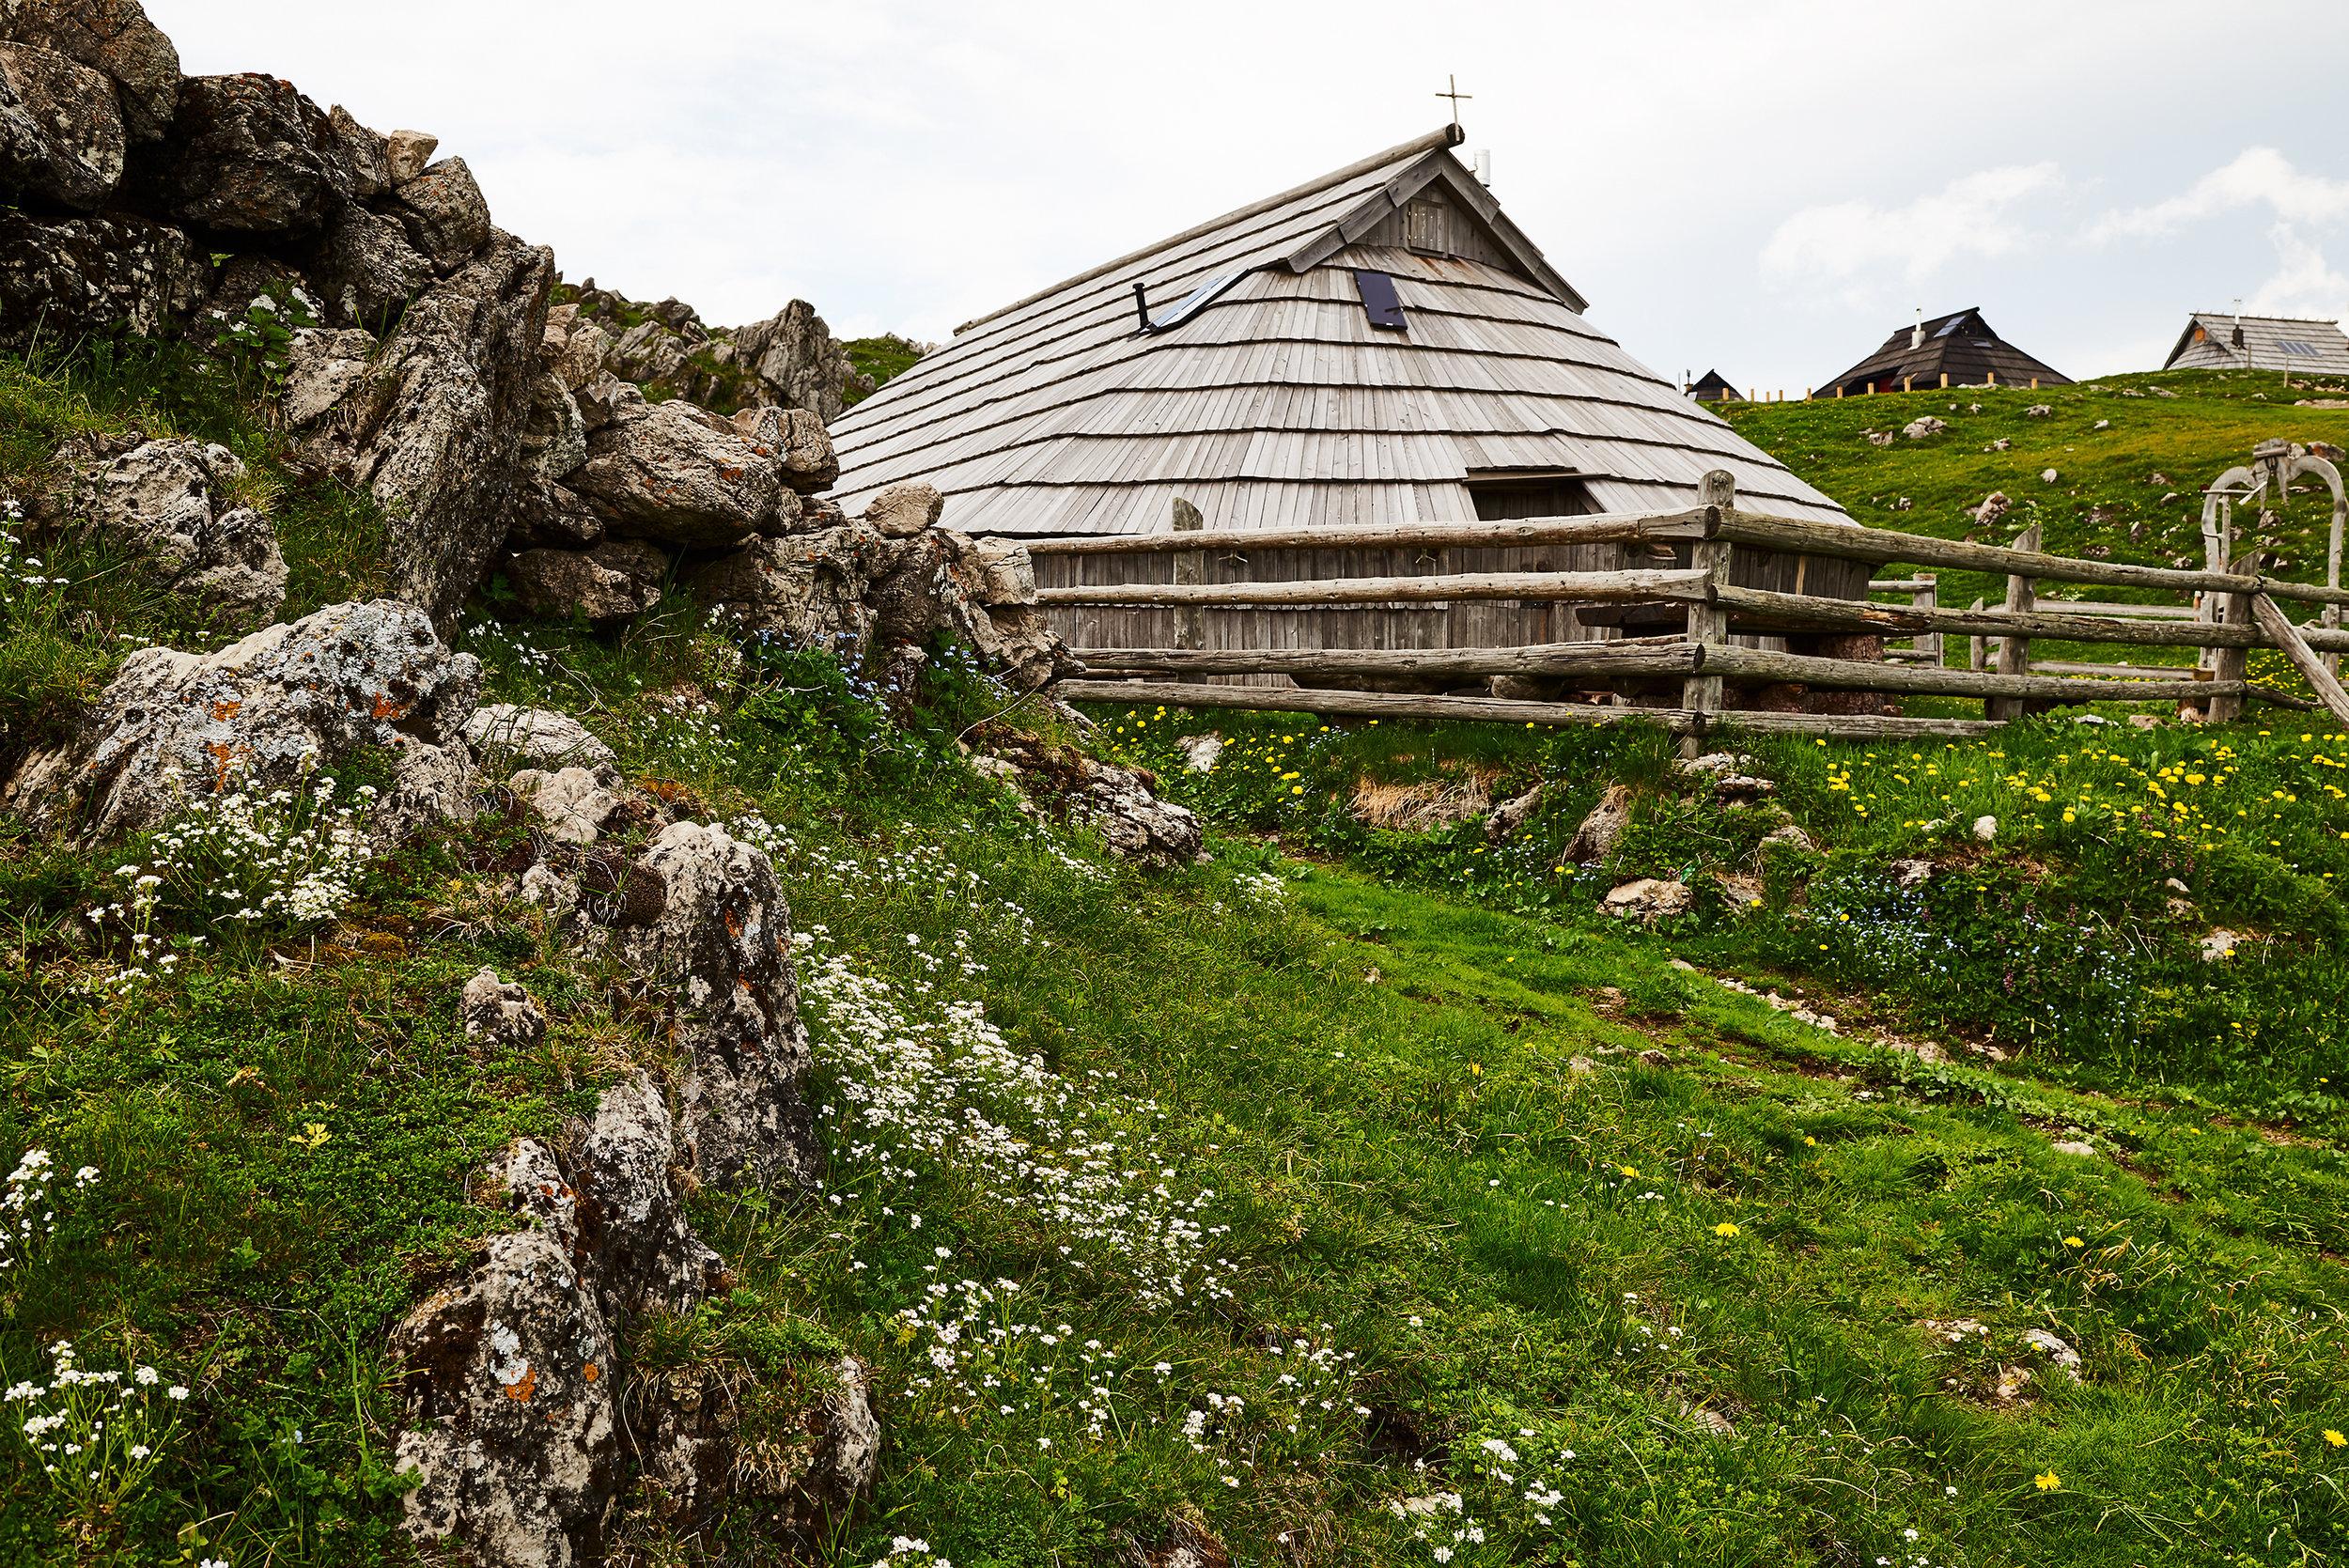 Sheppard's Huts